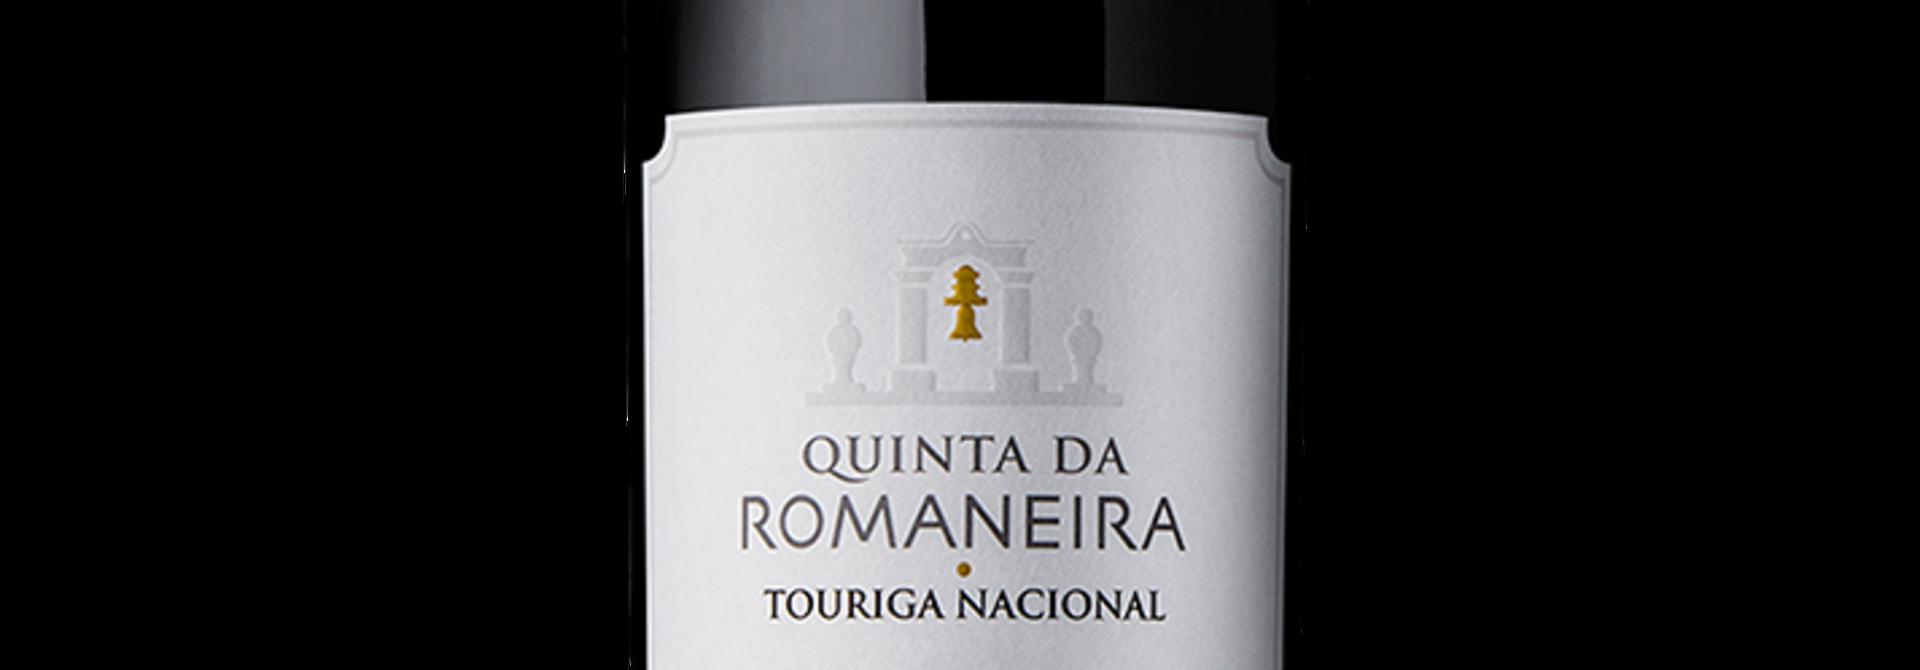 Quinta da Romaneira Touriga Nacional 2014